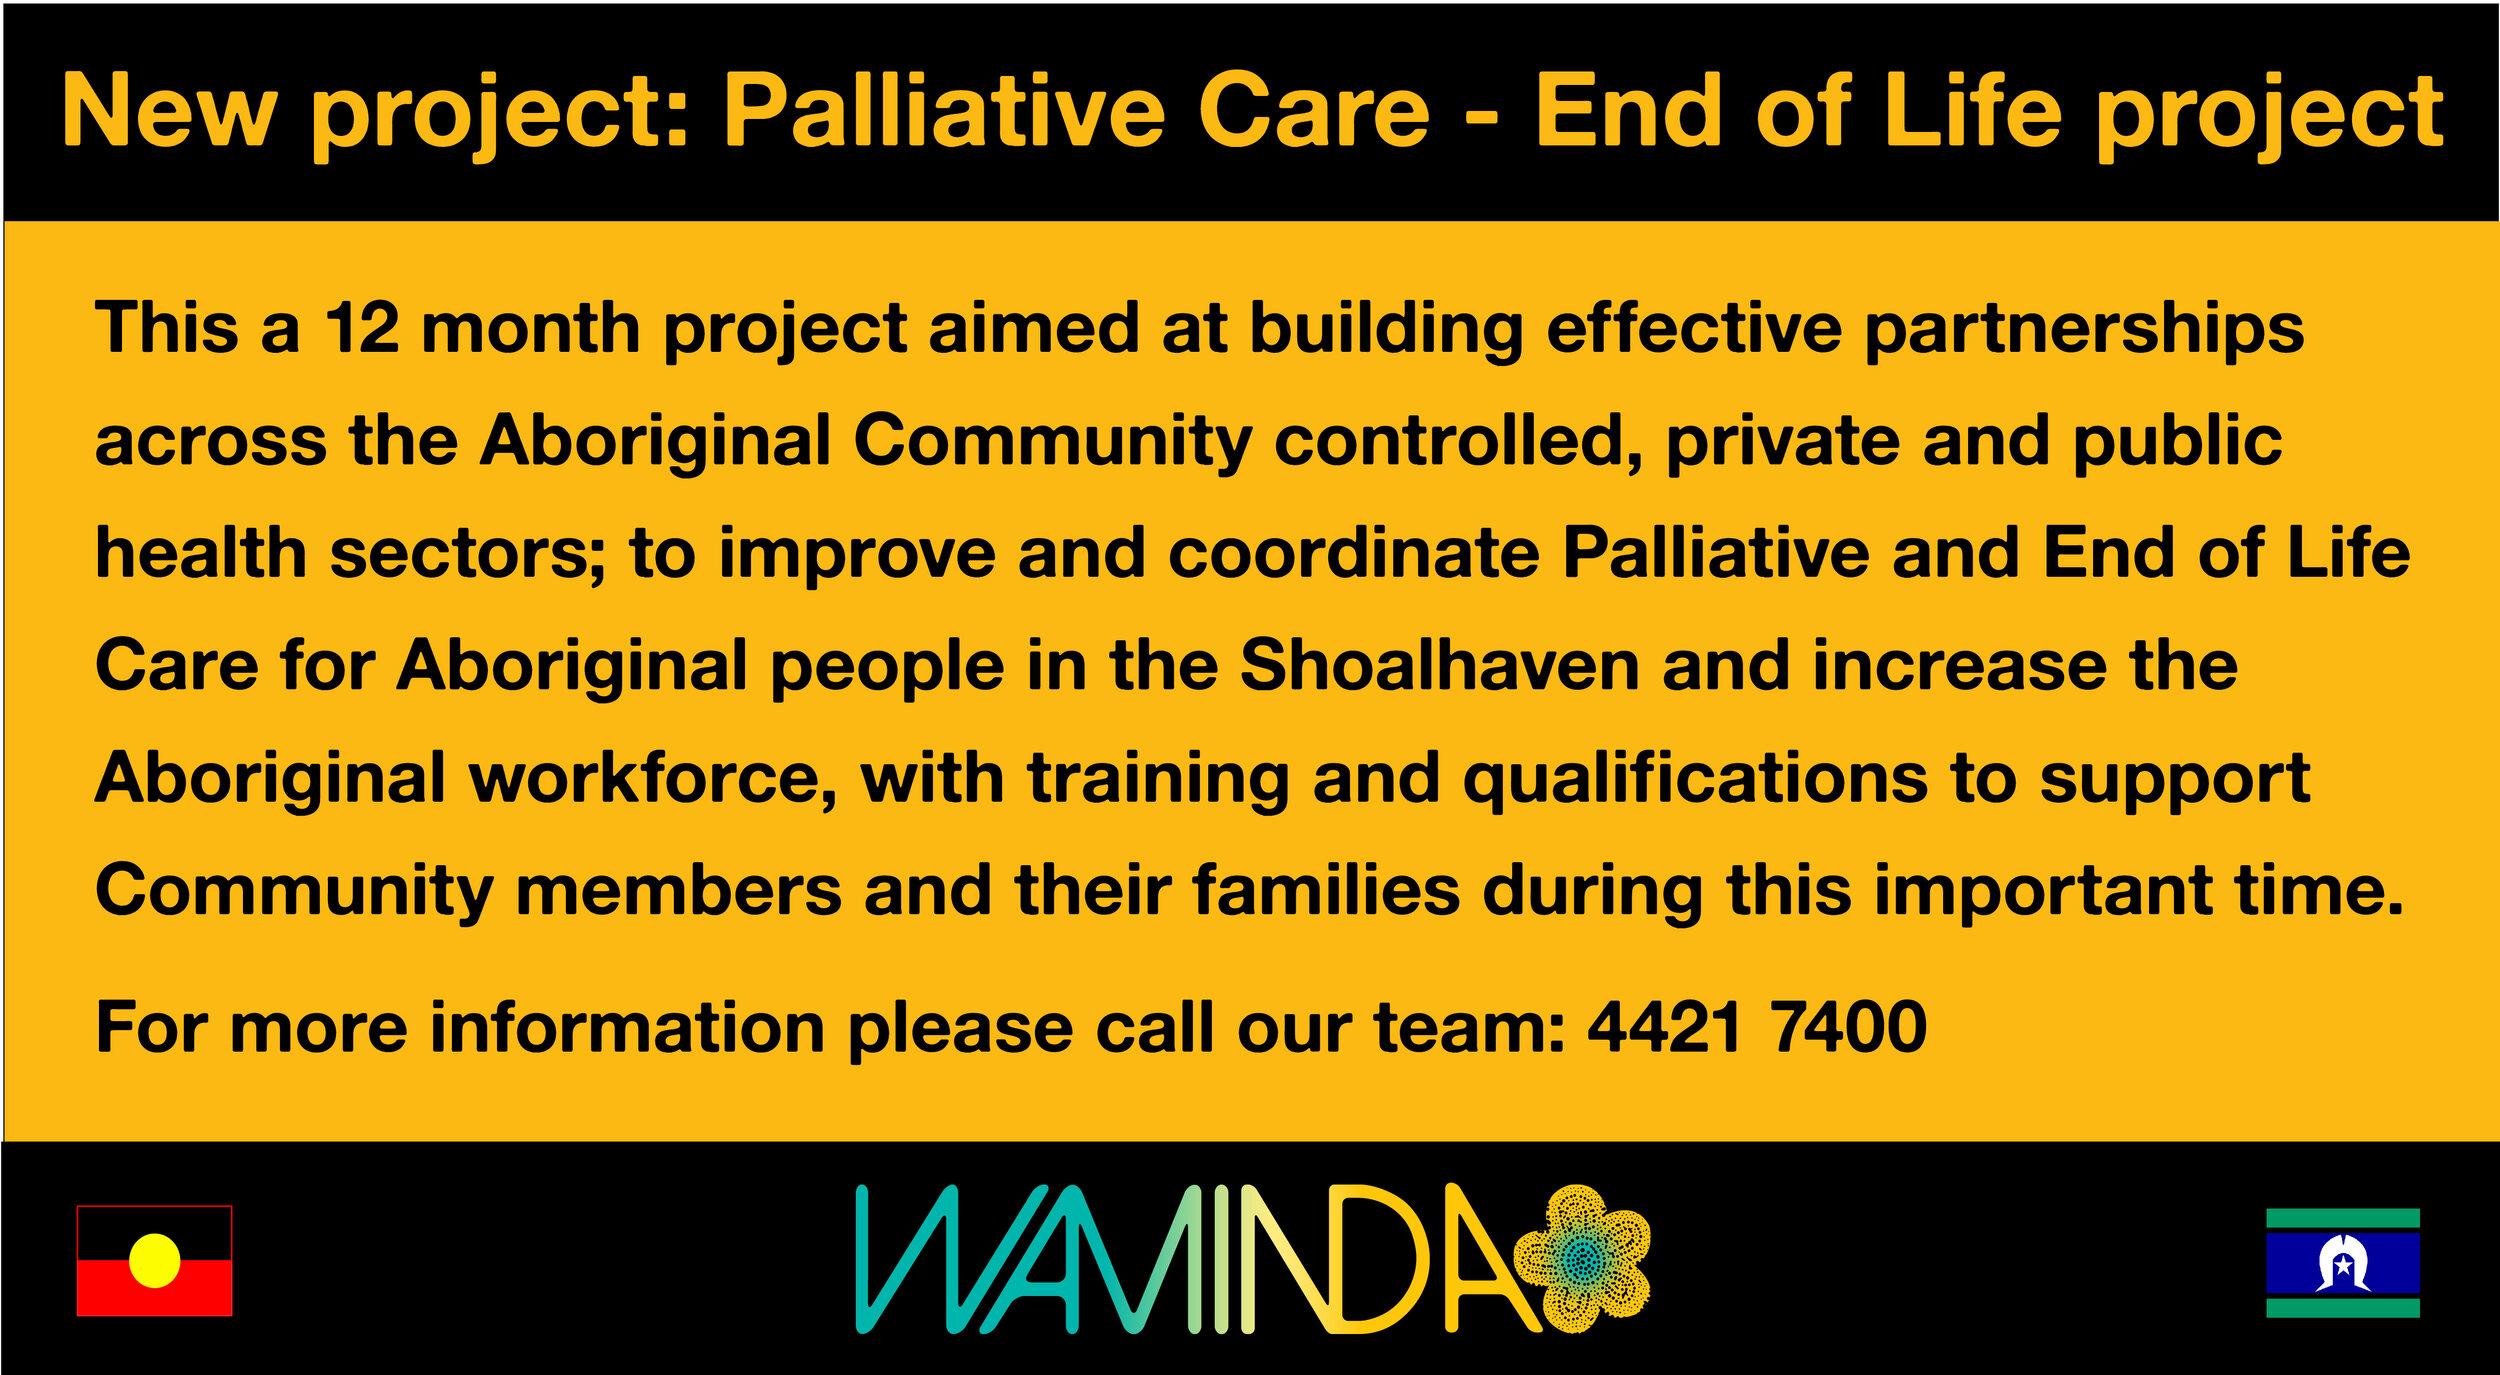 Cancer Care Palliative Care web banner-01.jpg